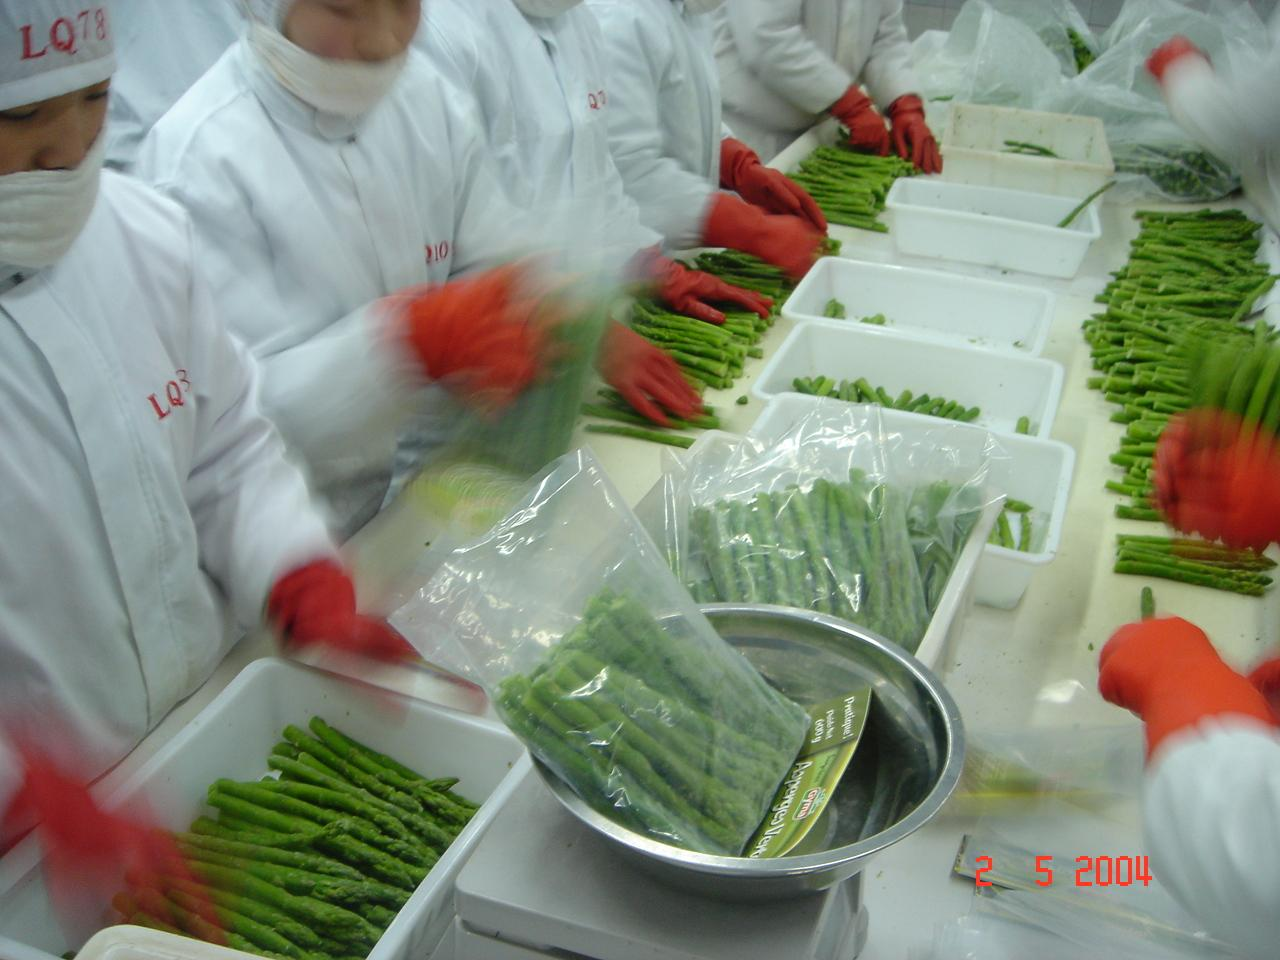 IQF Green Asparagus Cuts & Tips,Frozen Green Asparagus Tips & Cuts 17